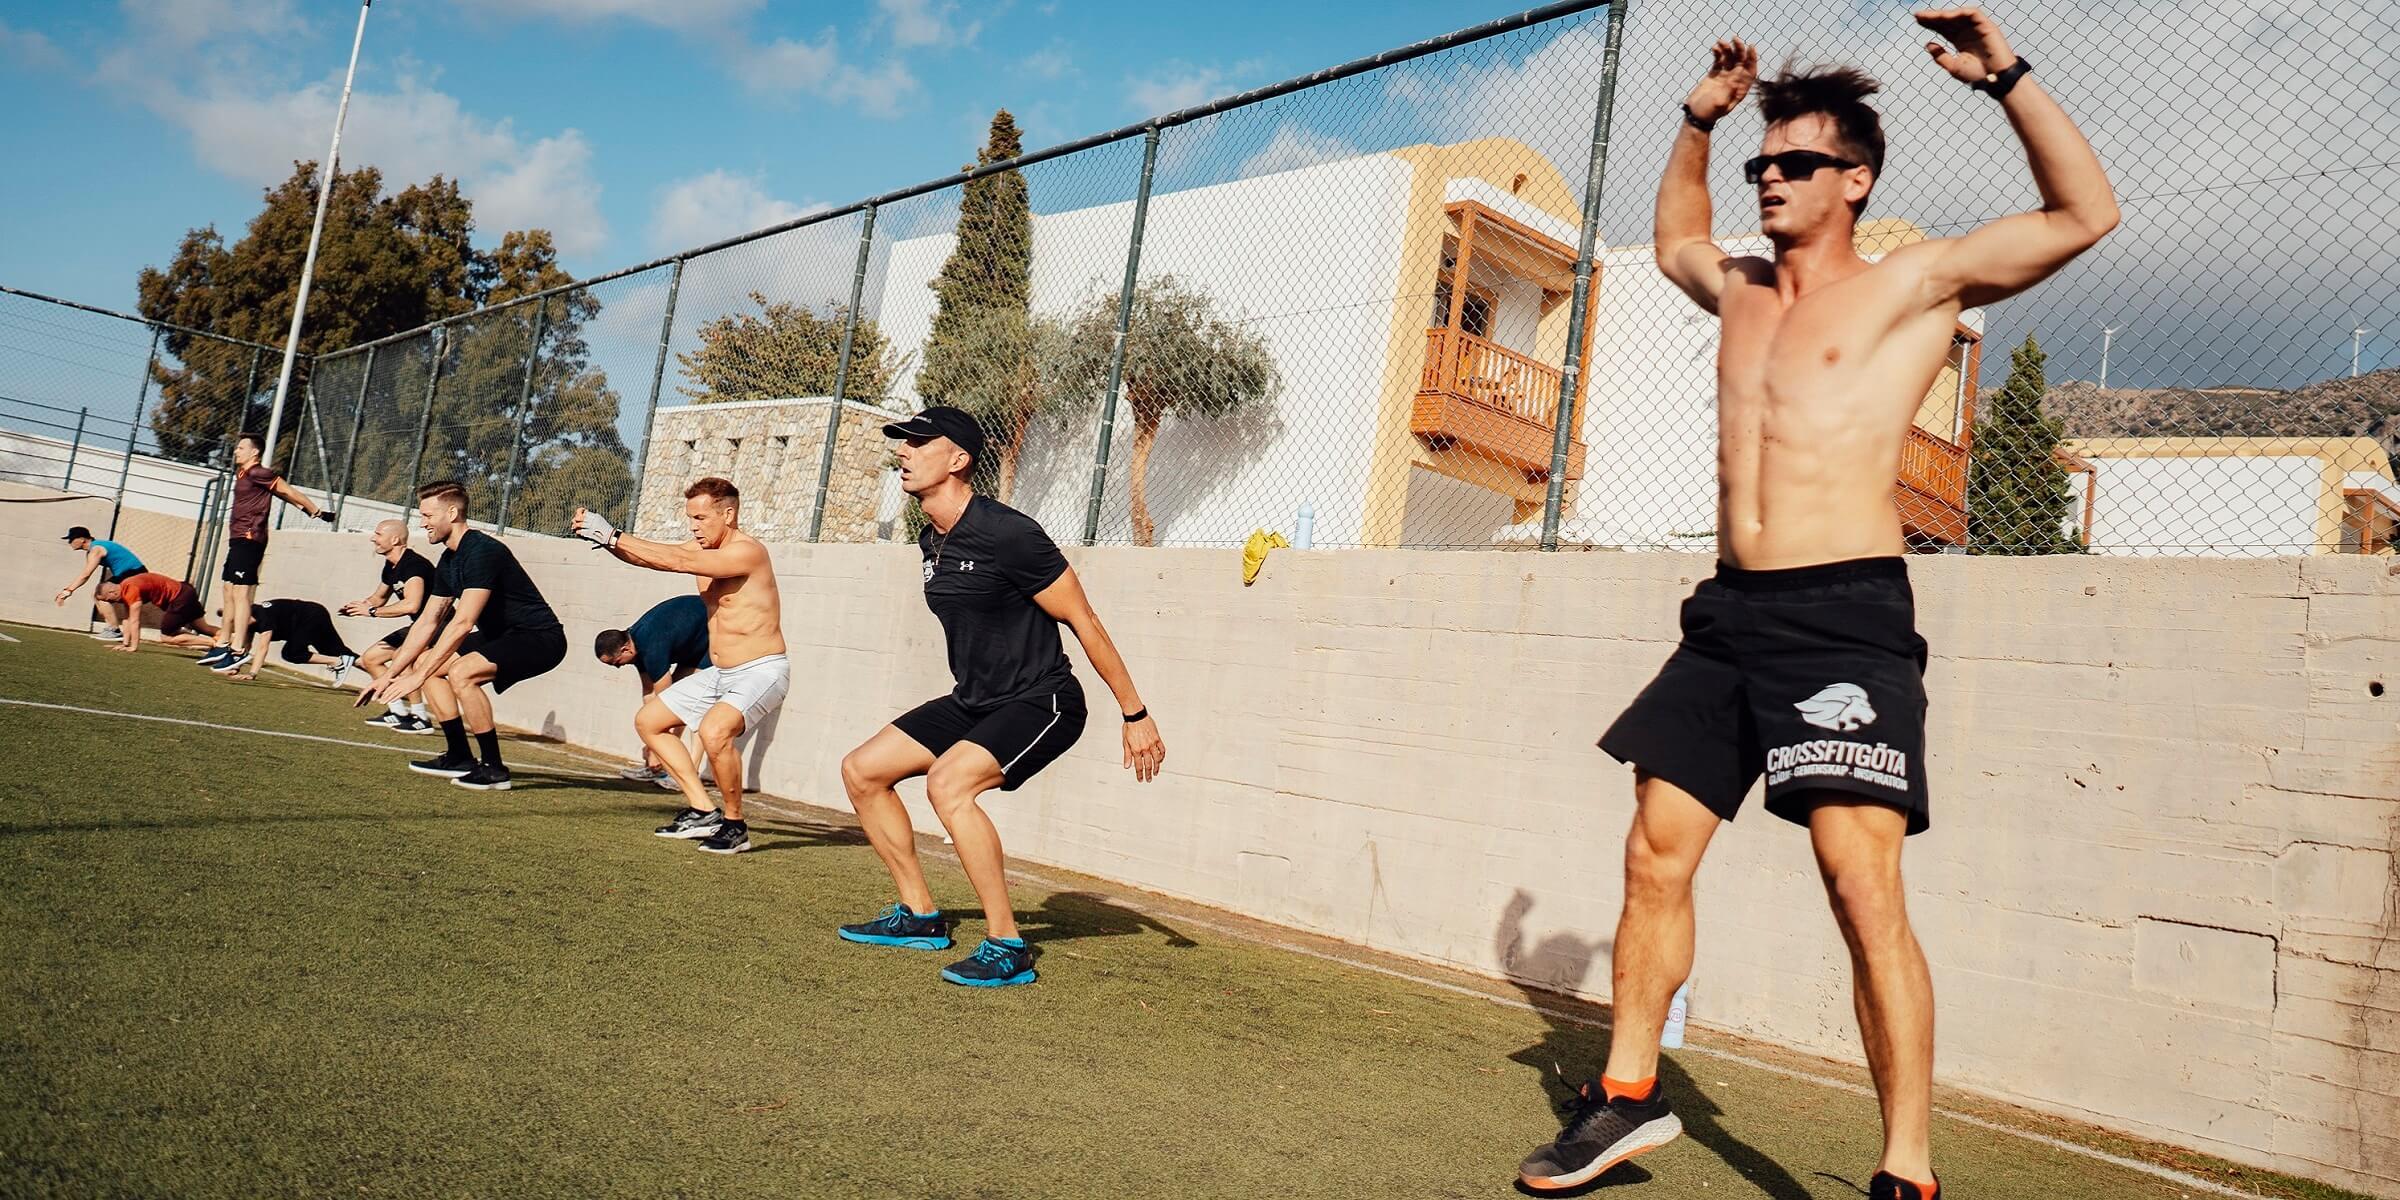 Men's Health Camp - Jumping